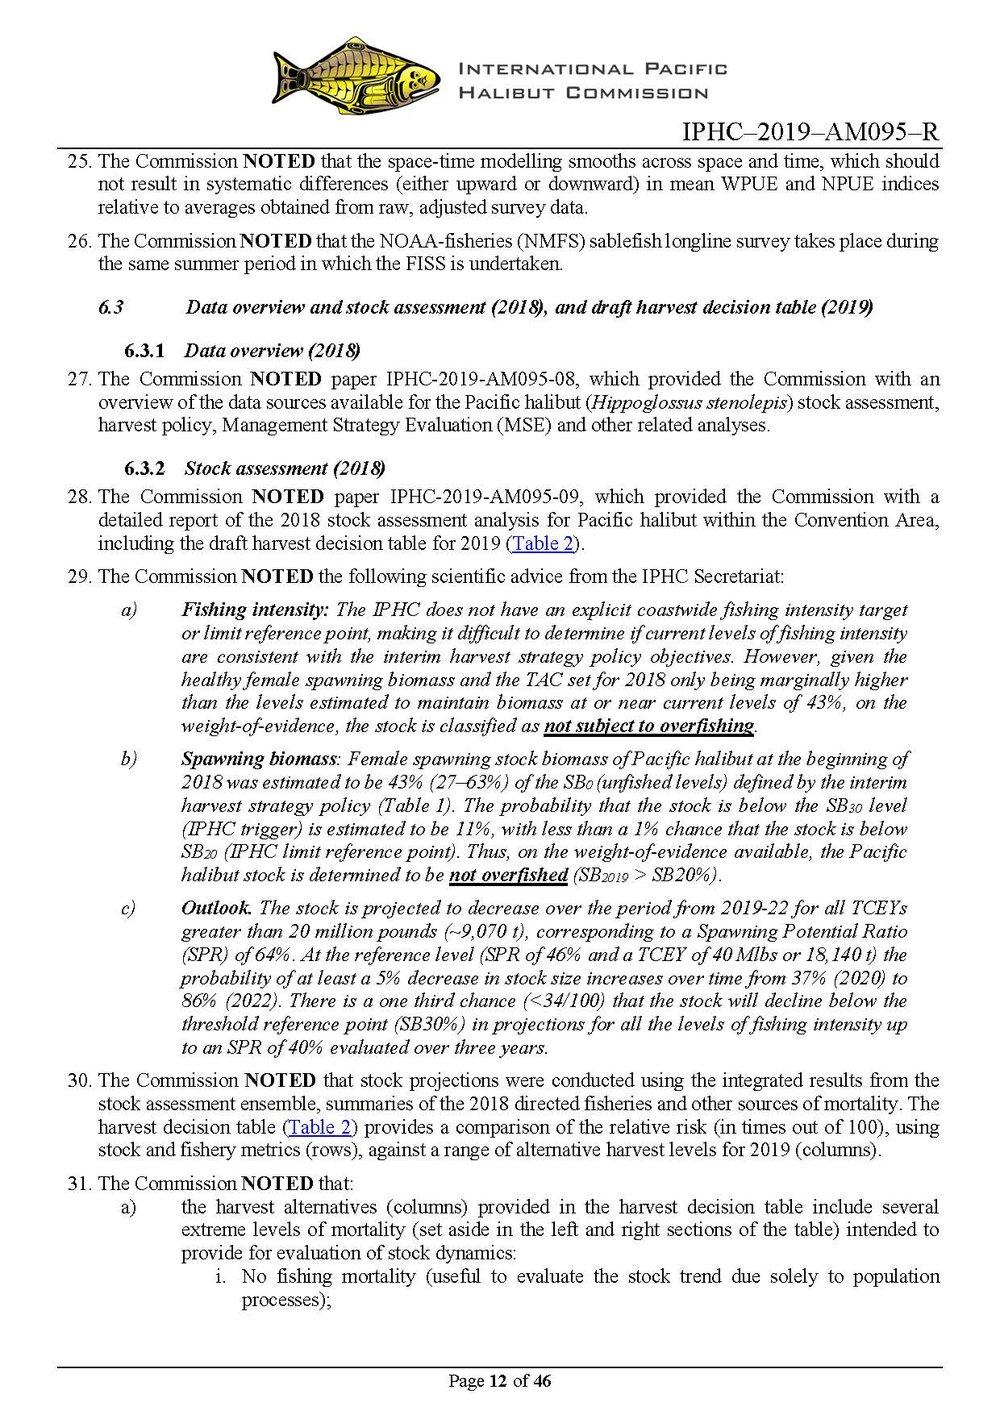 iphc-2019-am095-r_Page_12.jpg